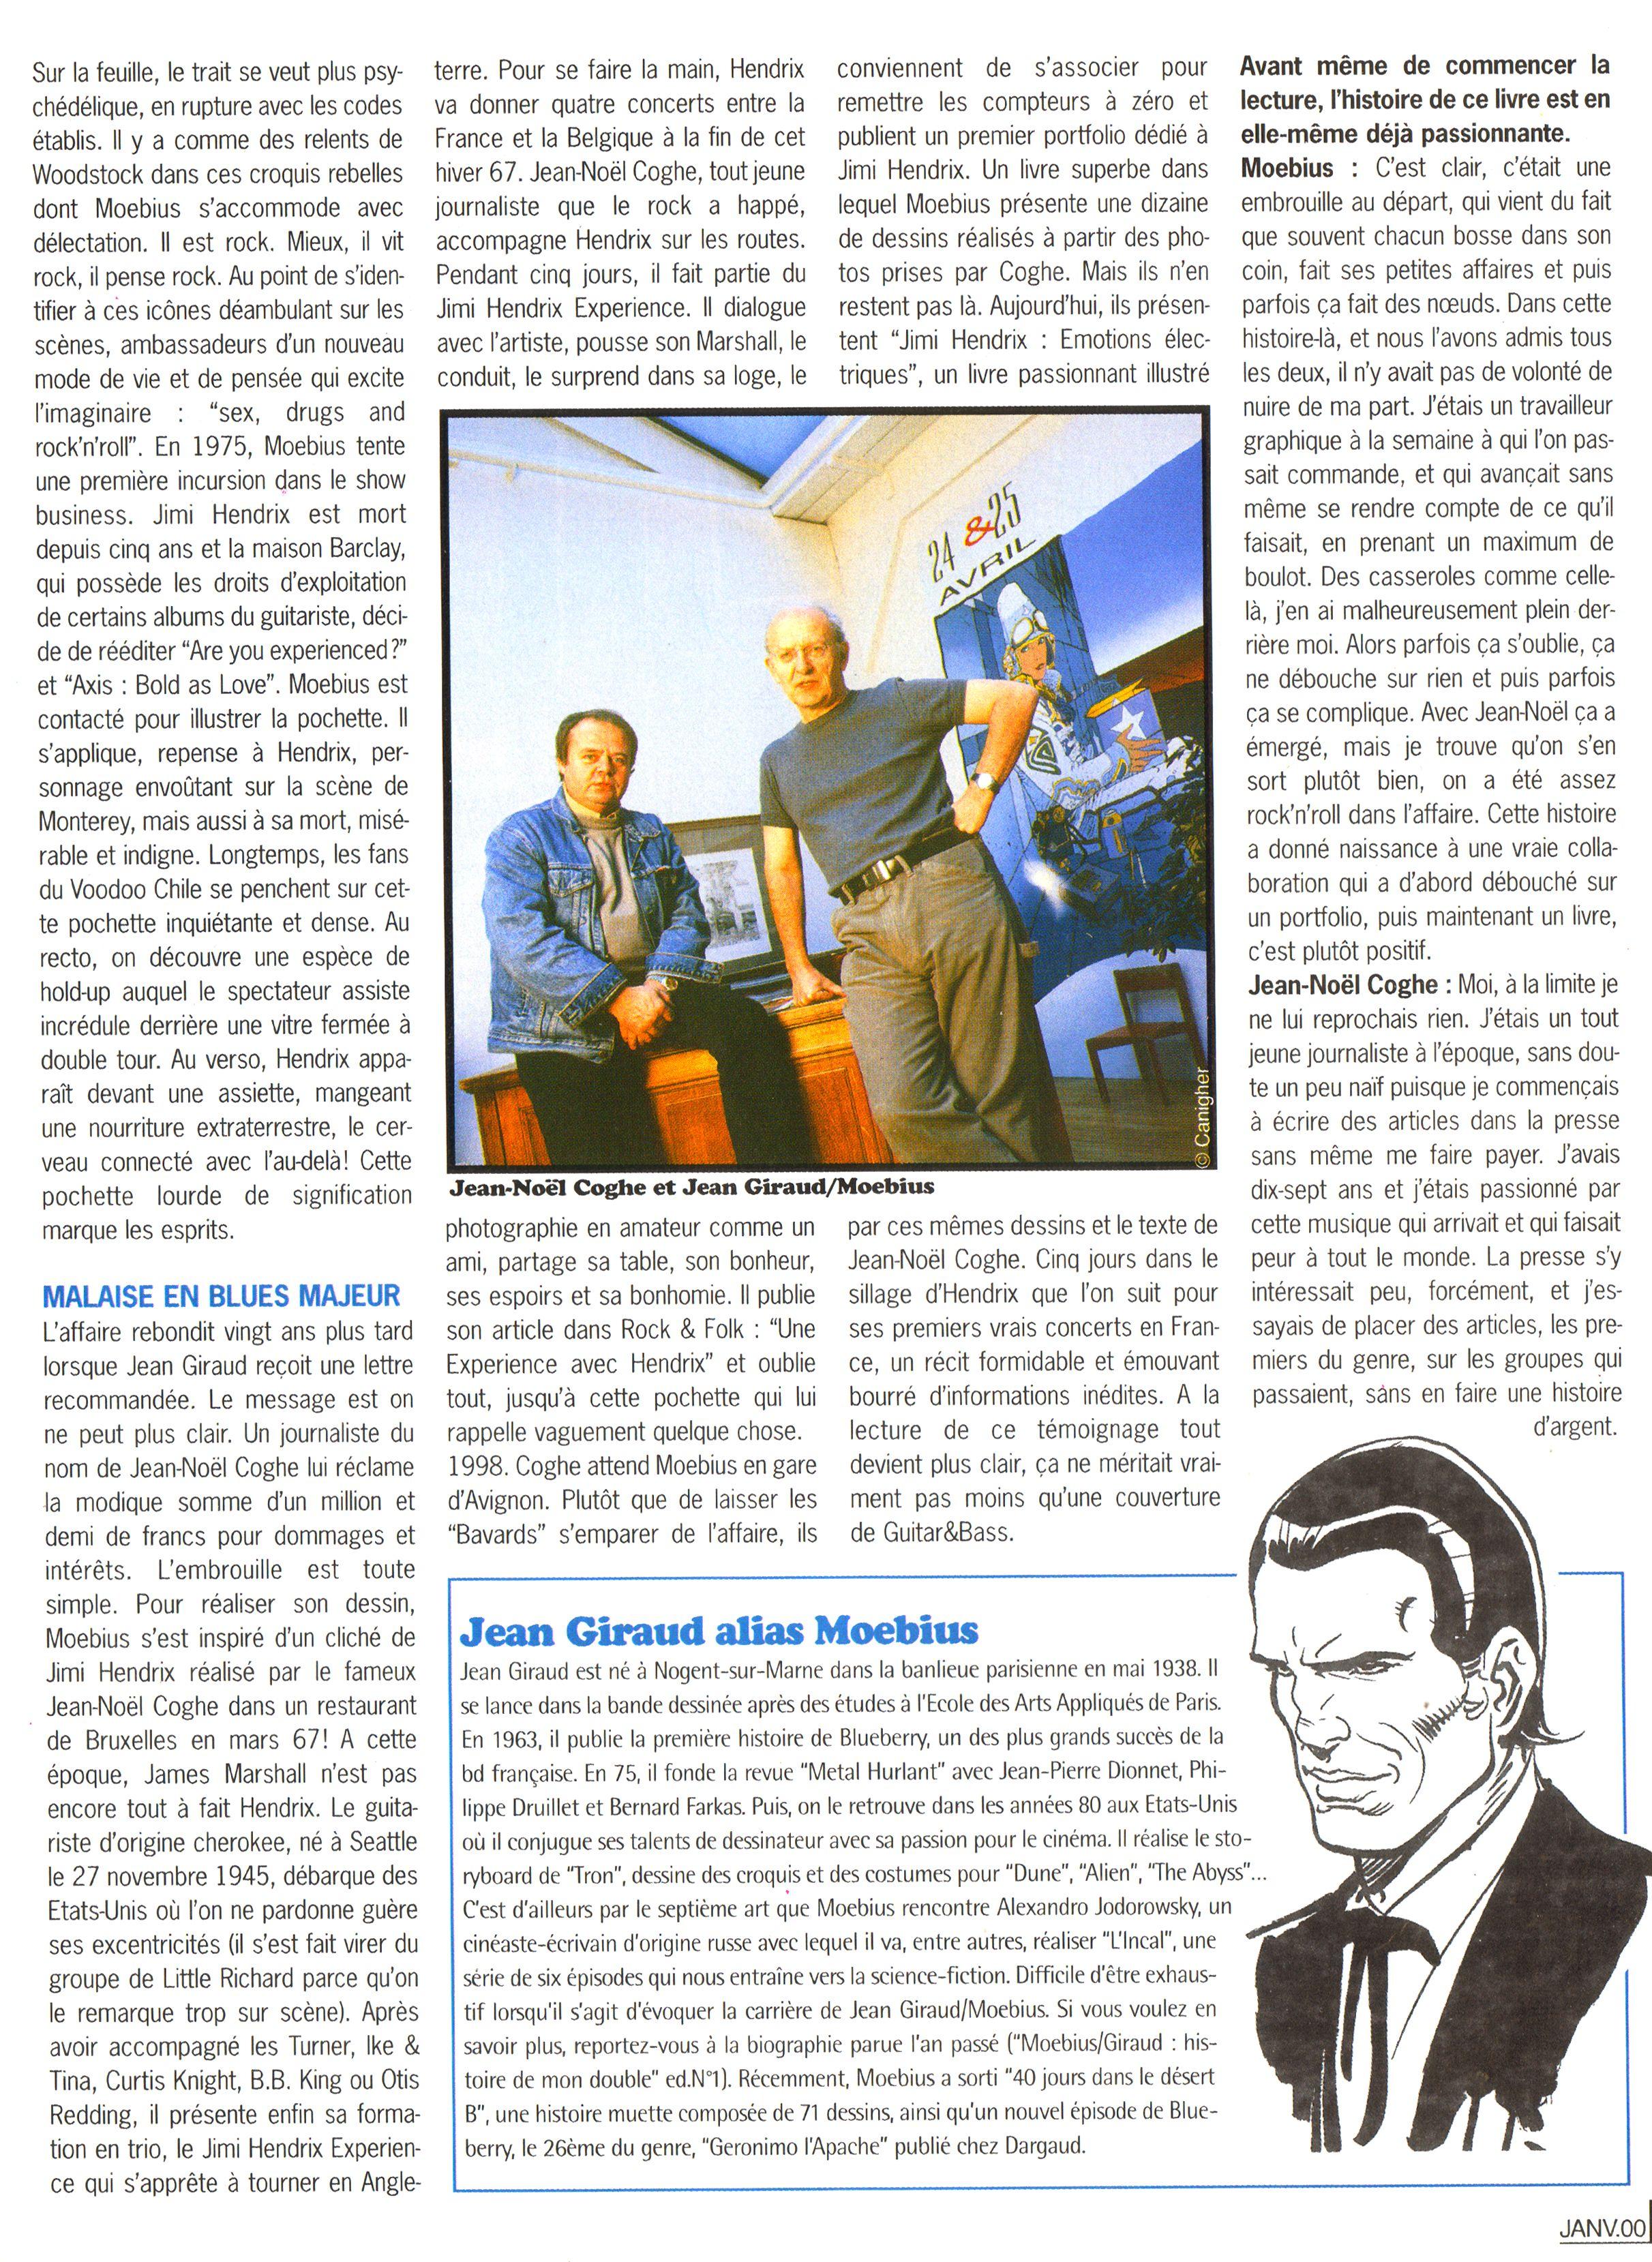 Magazines Français 1989 - 2014 GuitaretBassJanvier2000Page25